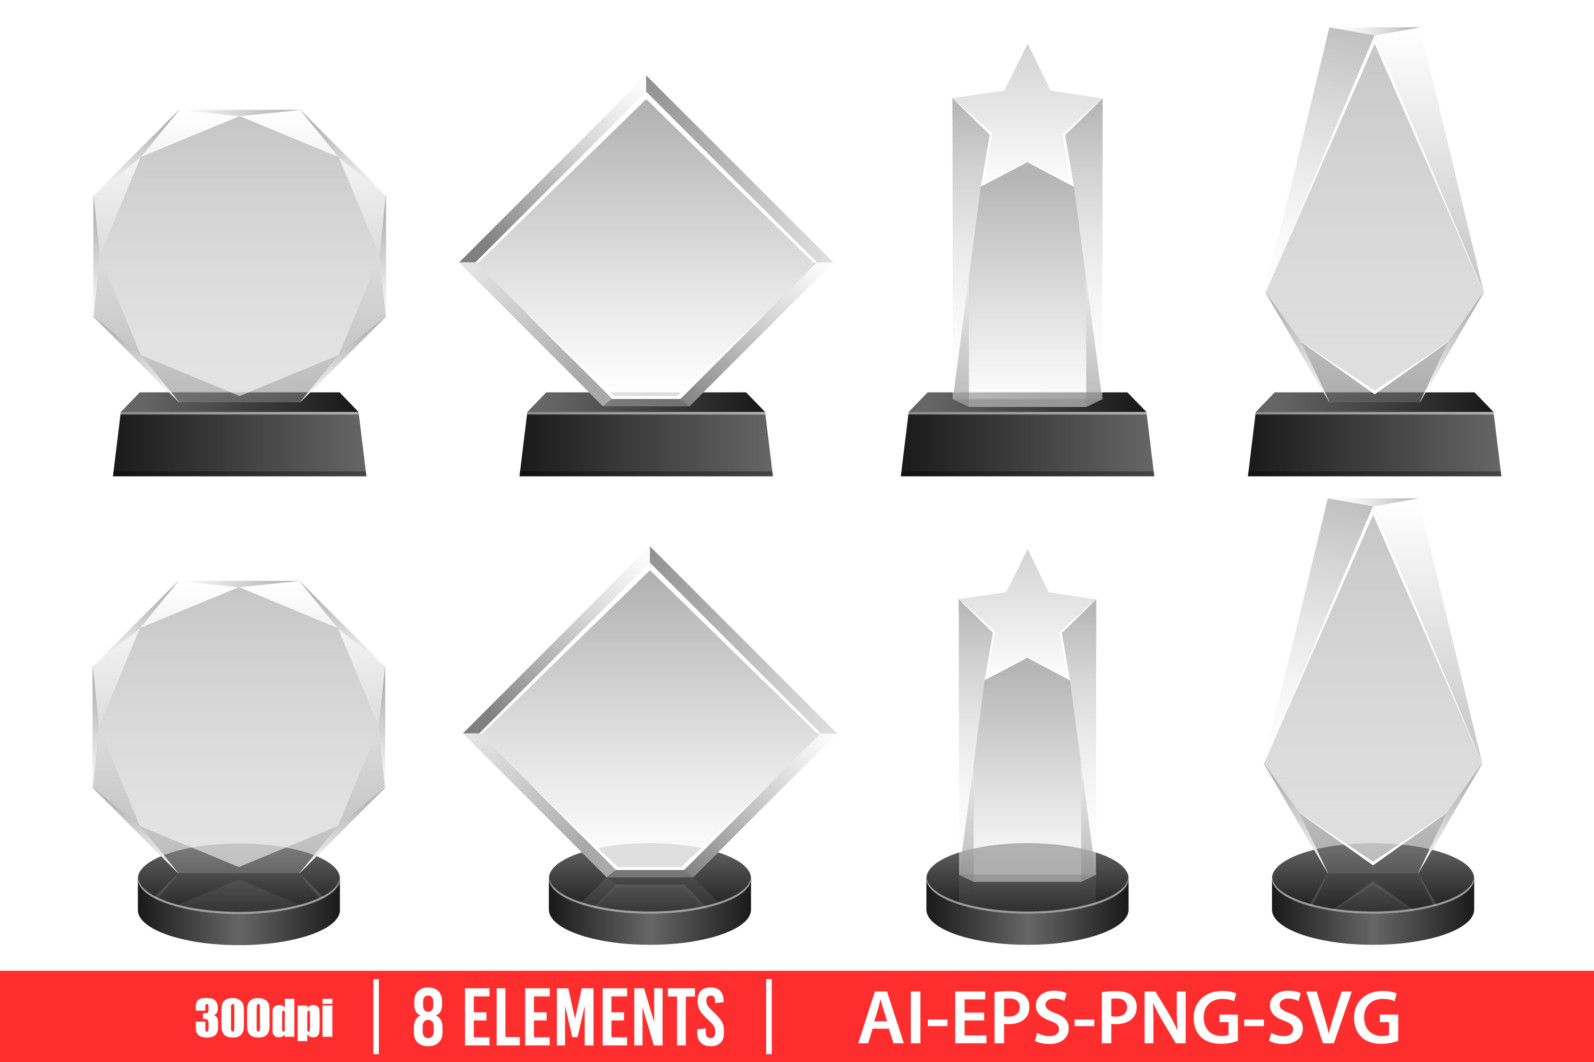 Winner glass award clipart vector design illustration. Glass award set. Vector Clipart Print - GLASS AWARD scaled -